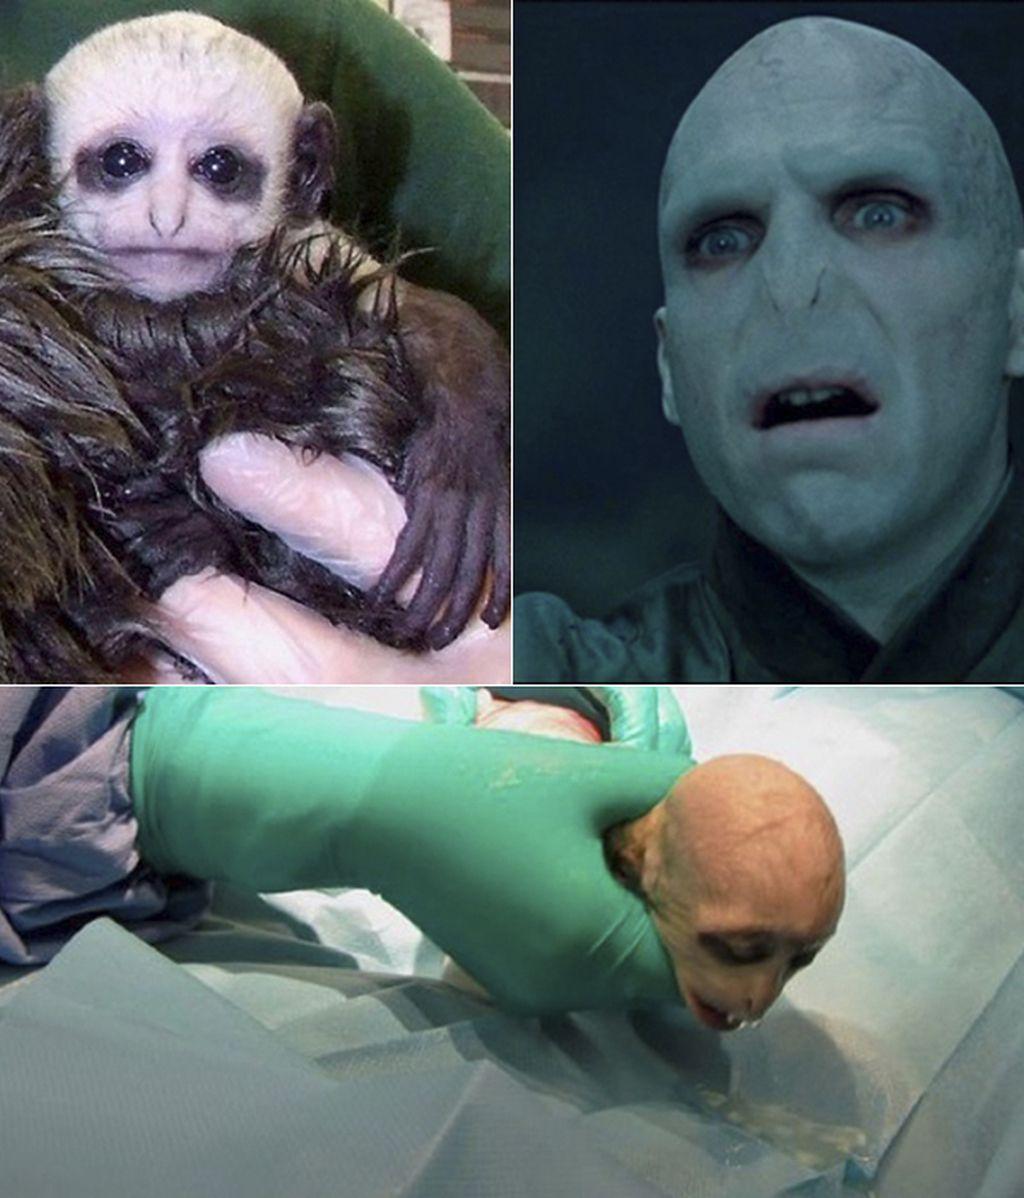 Montaje Voldemort y Voldemonkey